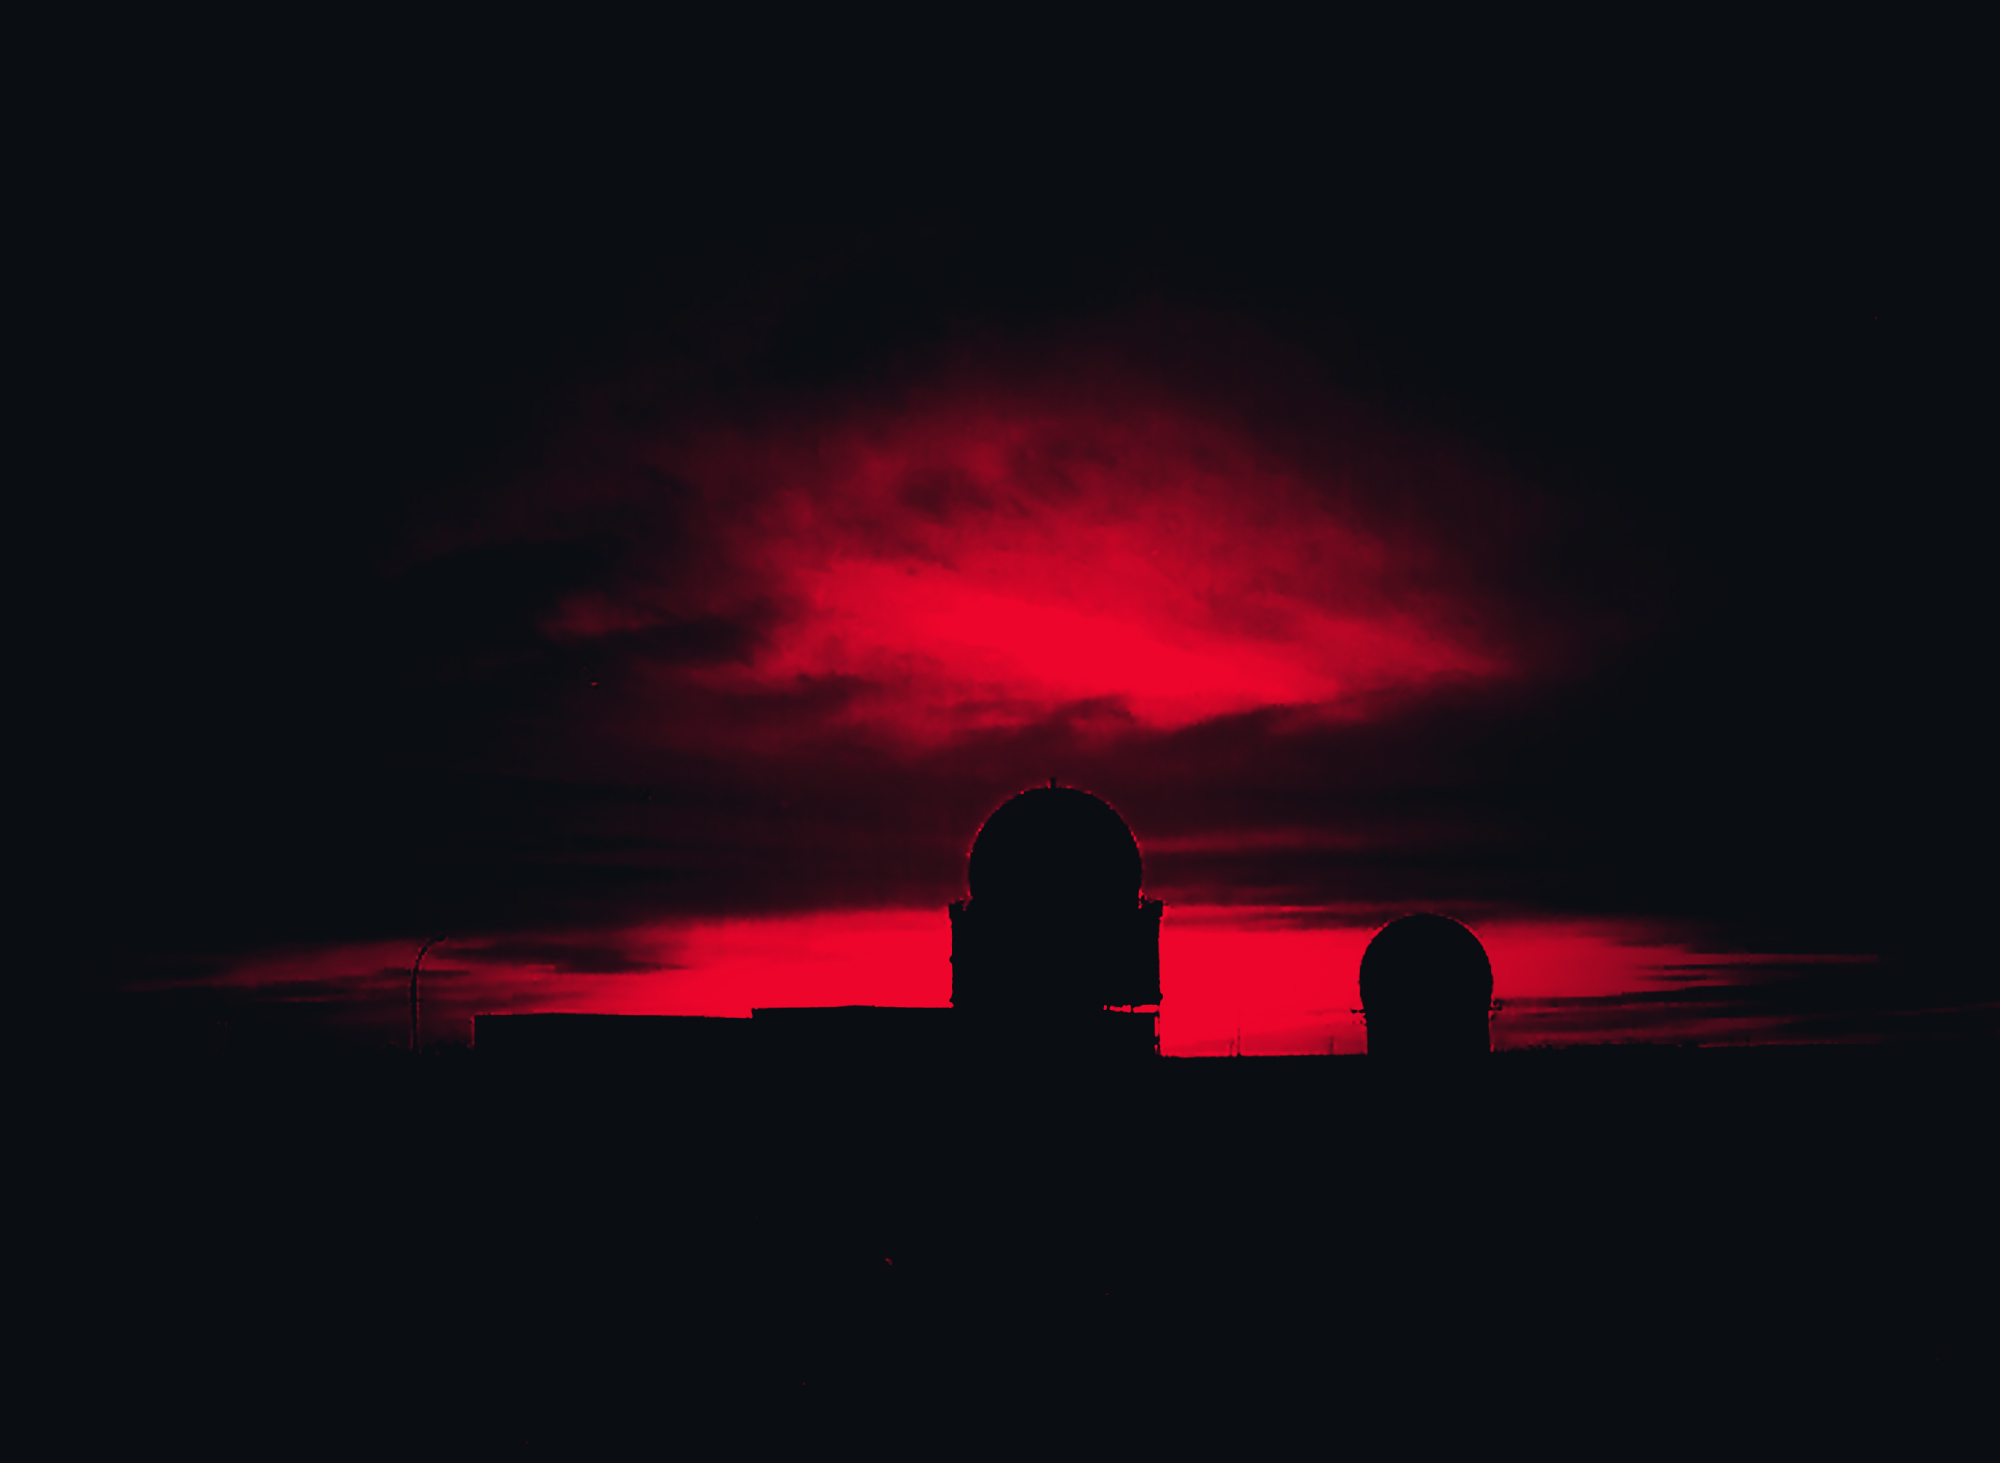 Sunset at CFS Yorkton - 13 January 19b86